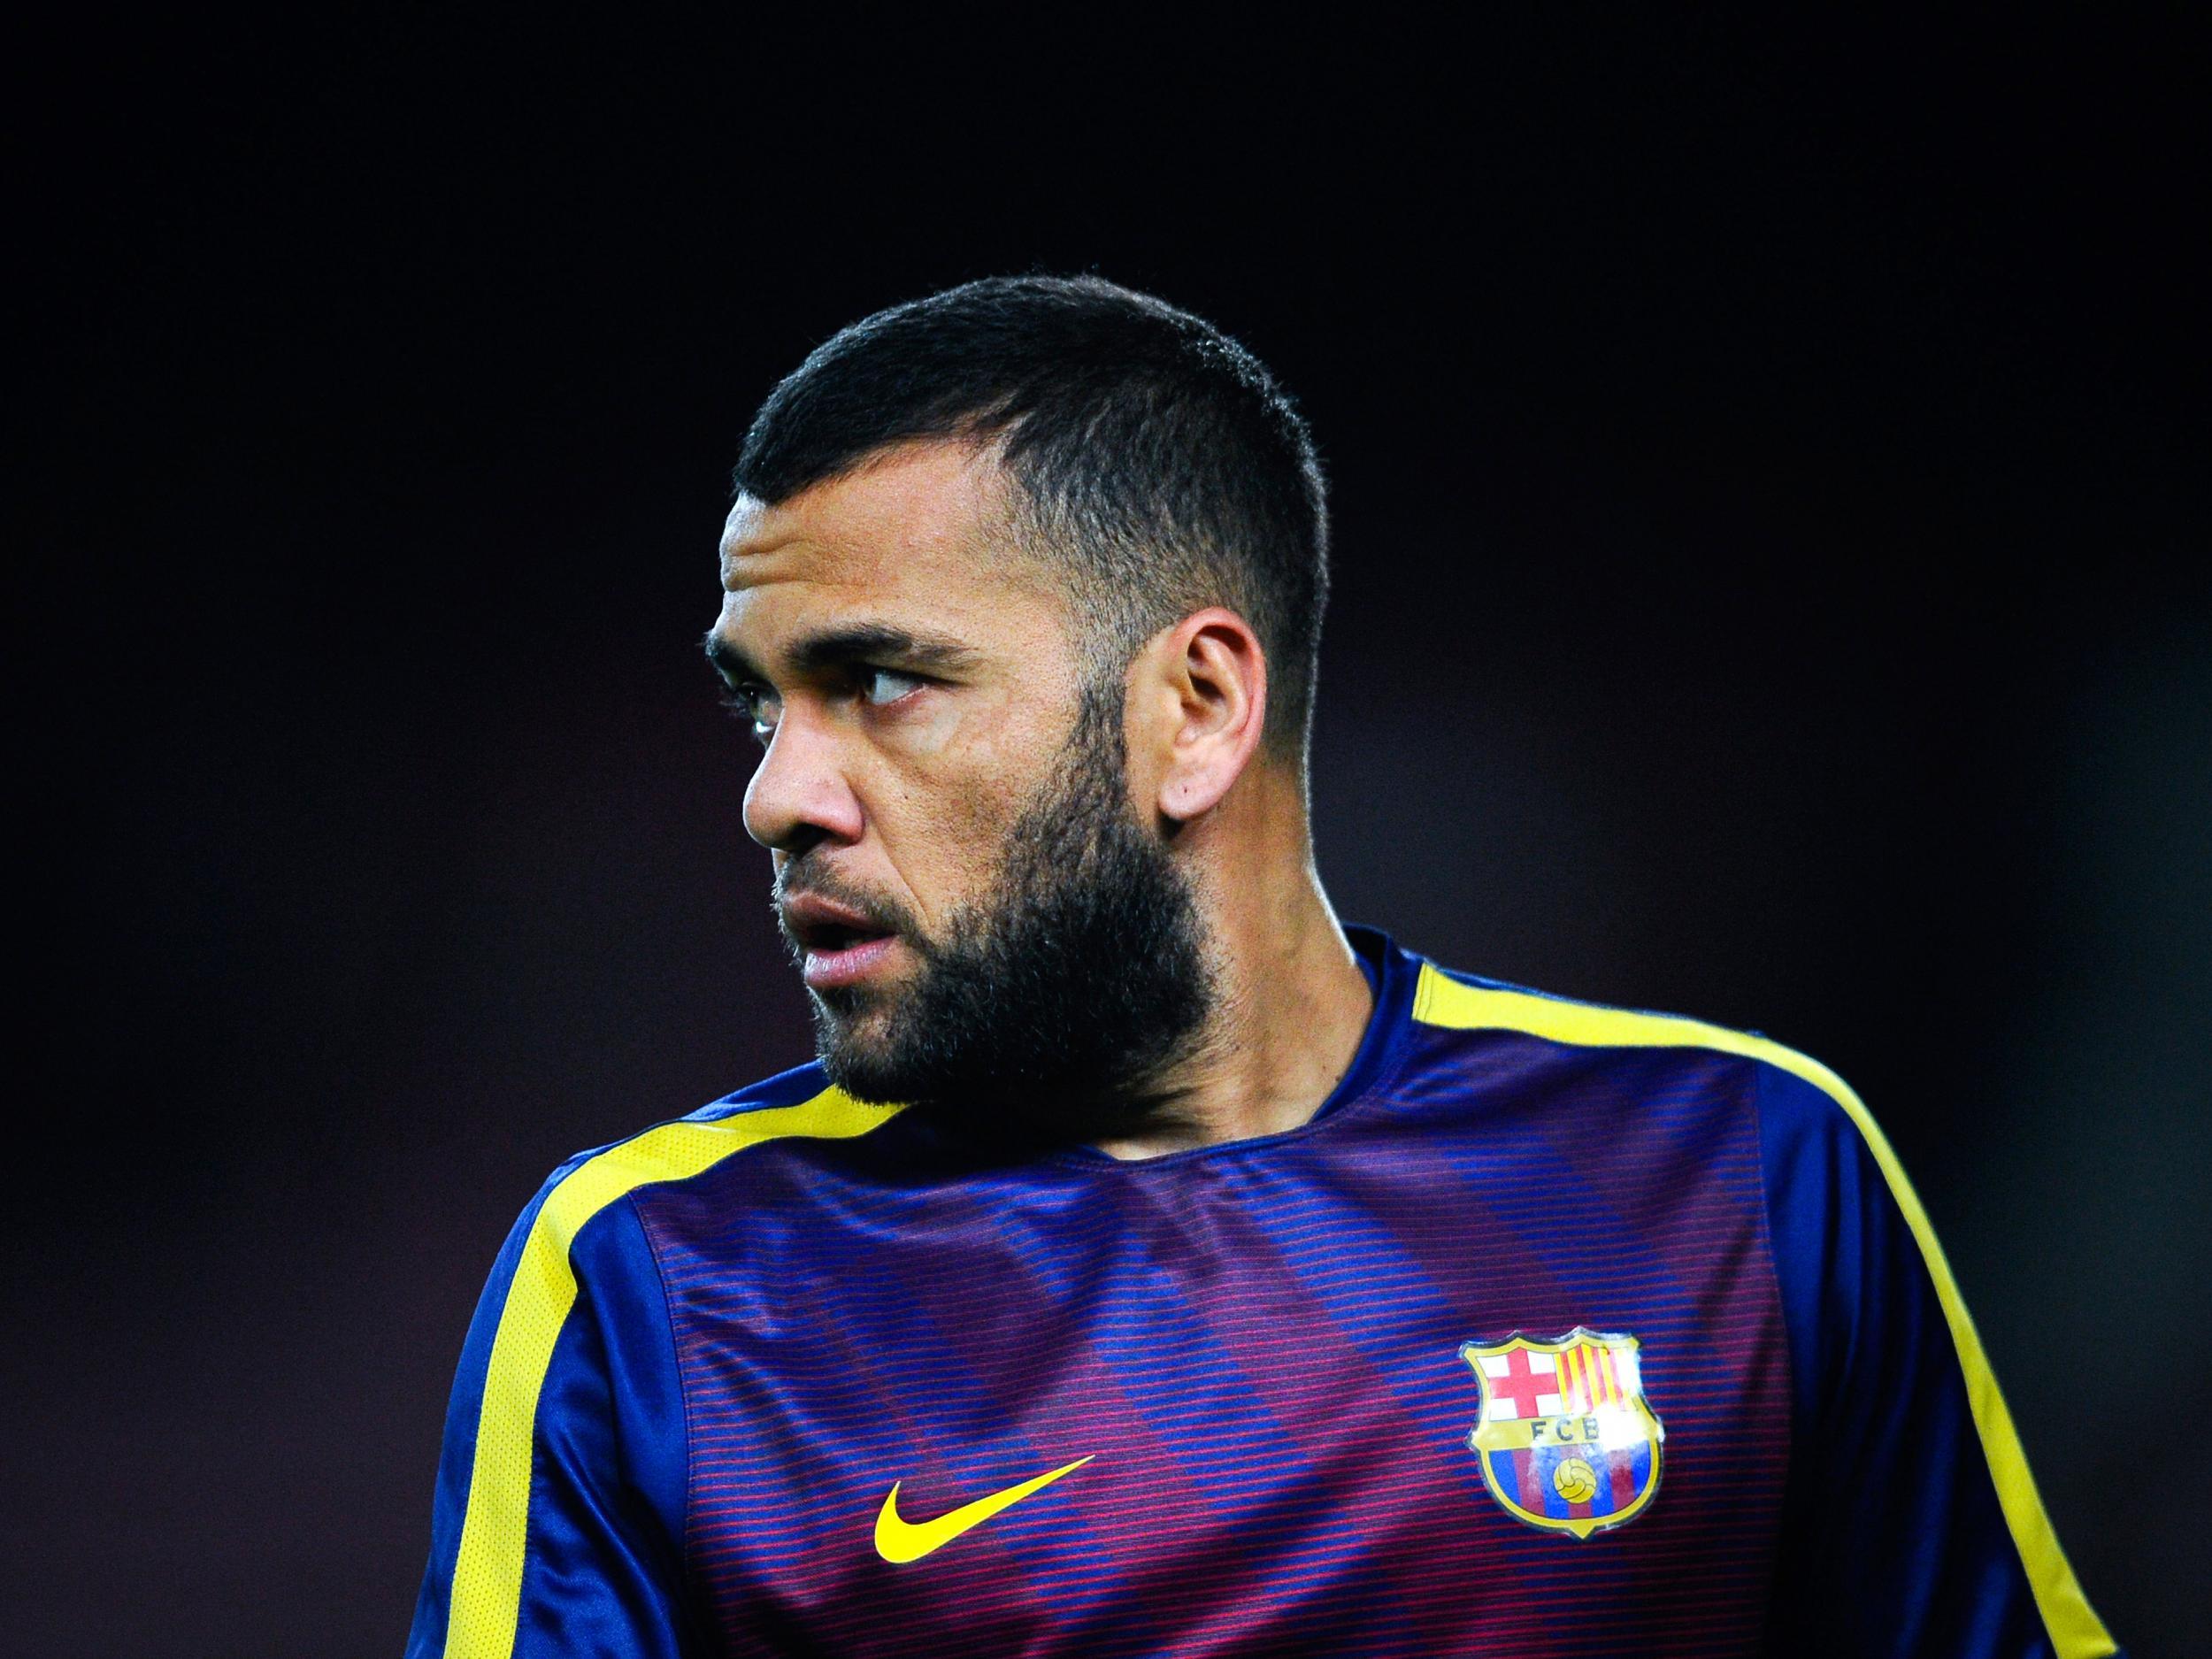 Dani Alves attacks Barcelona as 'very false and ungrateful', although bears no ill will to Cristiano Ronaldo